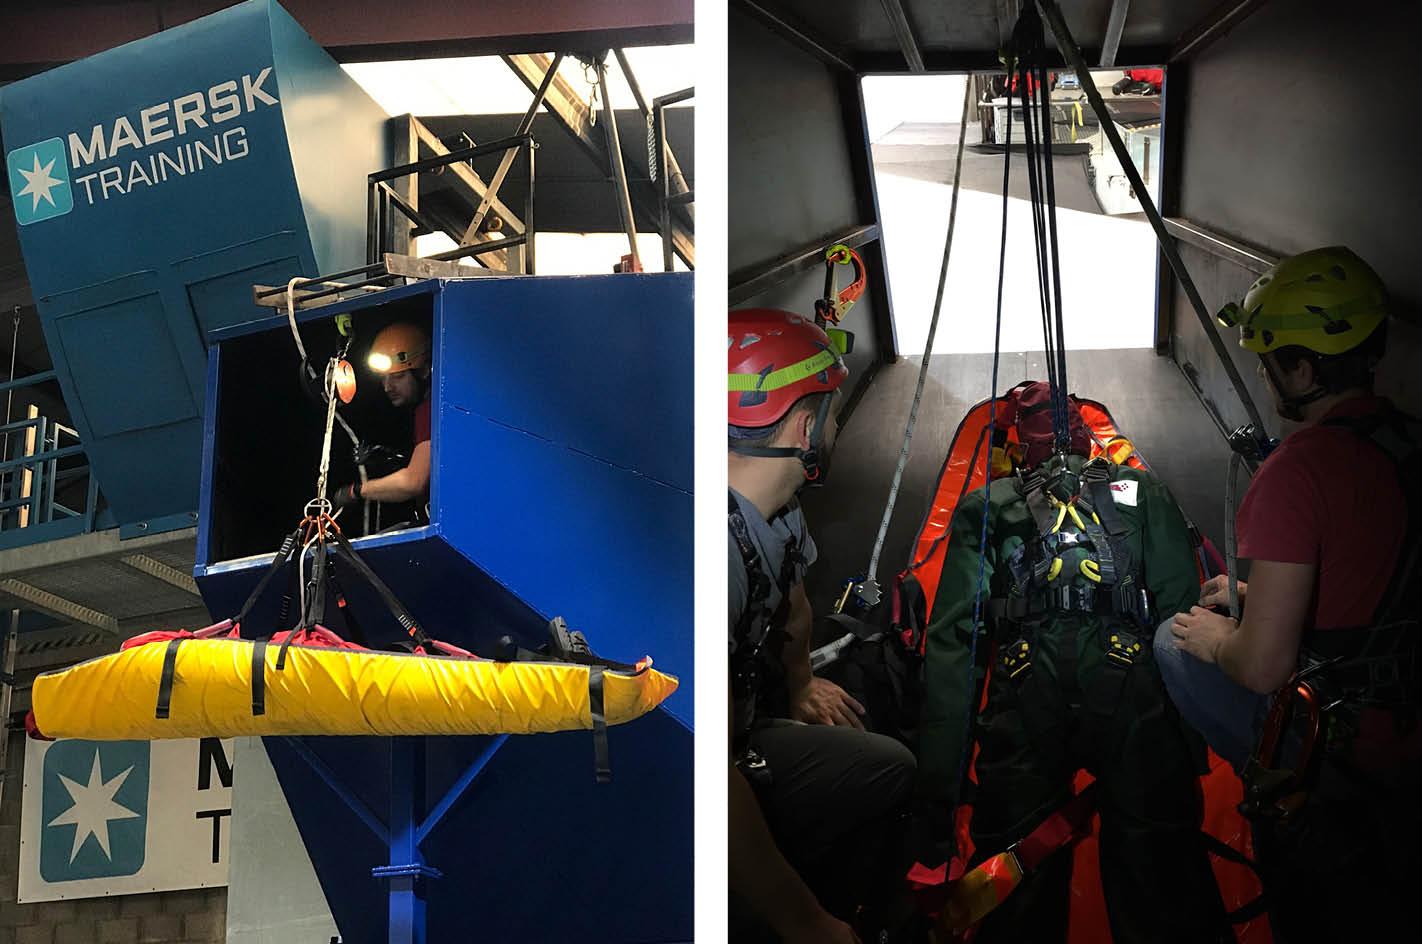 Maersk Training Aberdeen wind simulator 1024x680